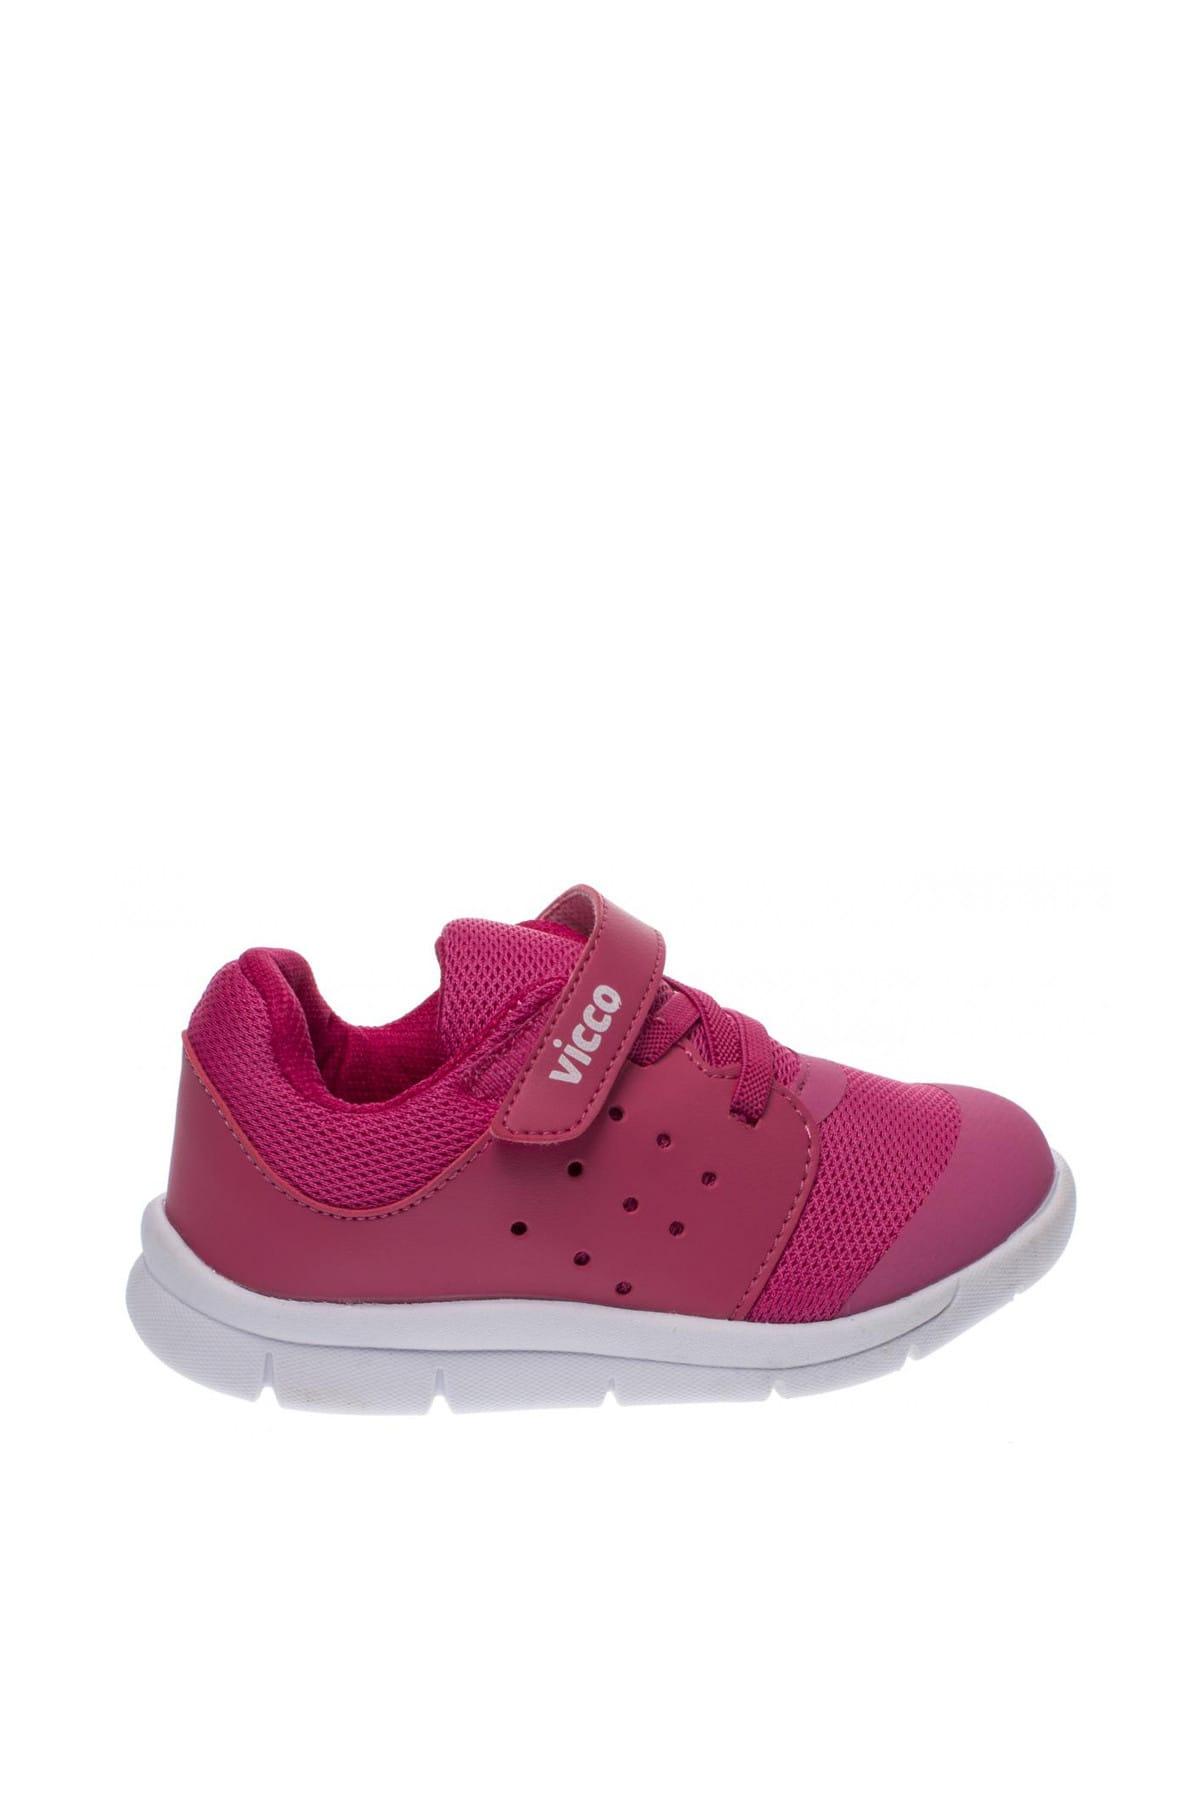 Vicco Fuşya Çocuk Sneaker 211 347.19Y191P 2